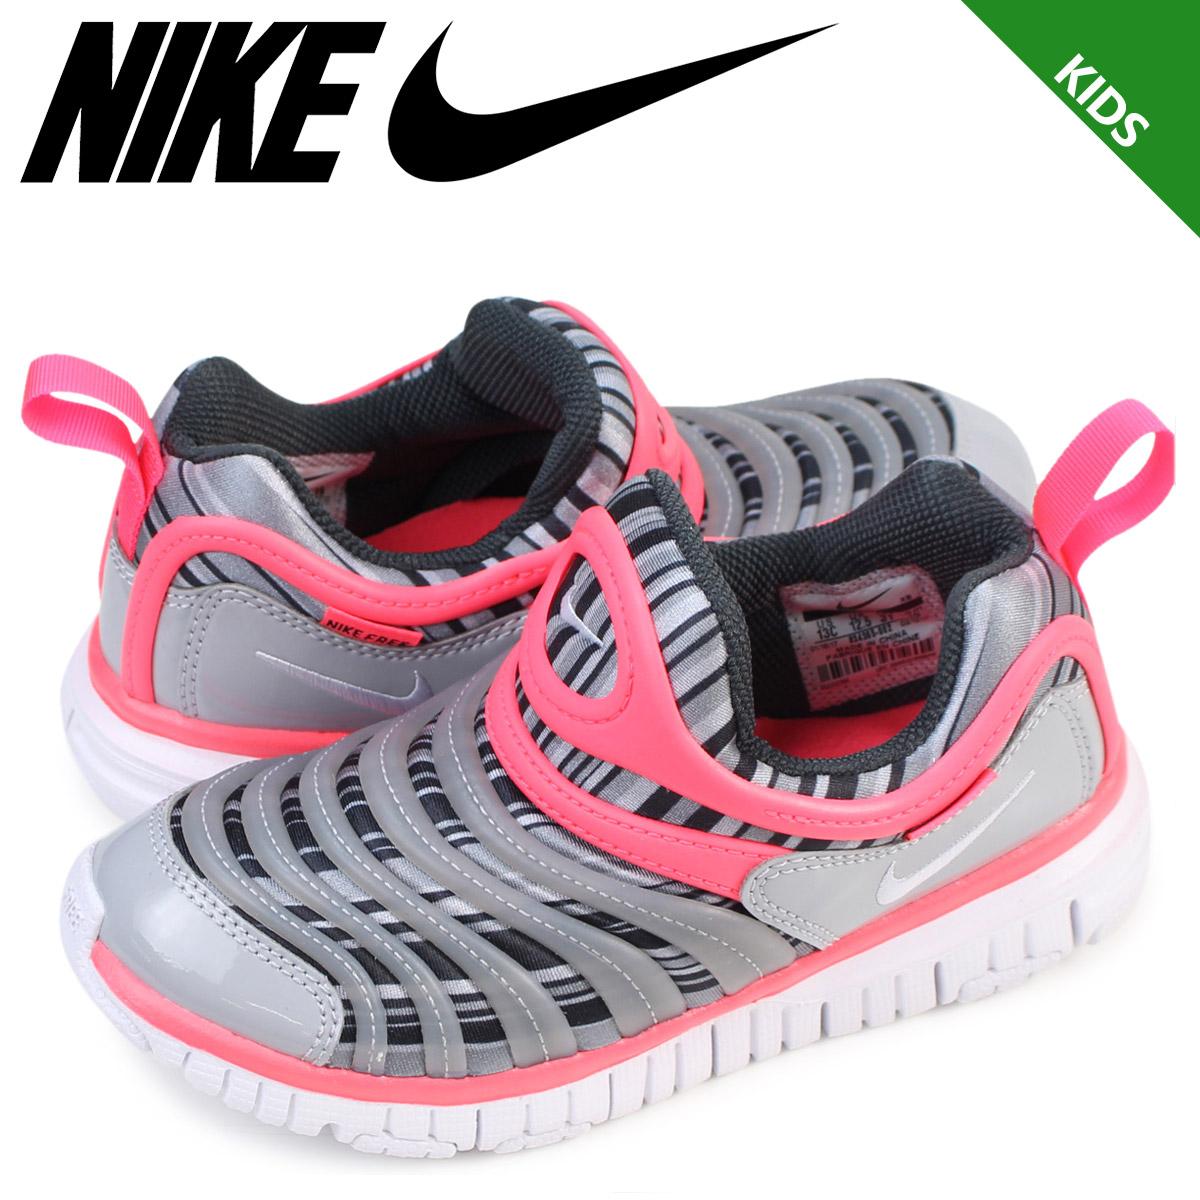 c54d09314f66 ... where can i buy nike nike dynamo free kids jr. child shoes sneakers dynamo  free